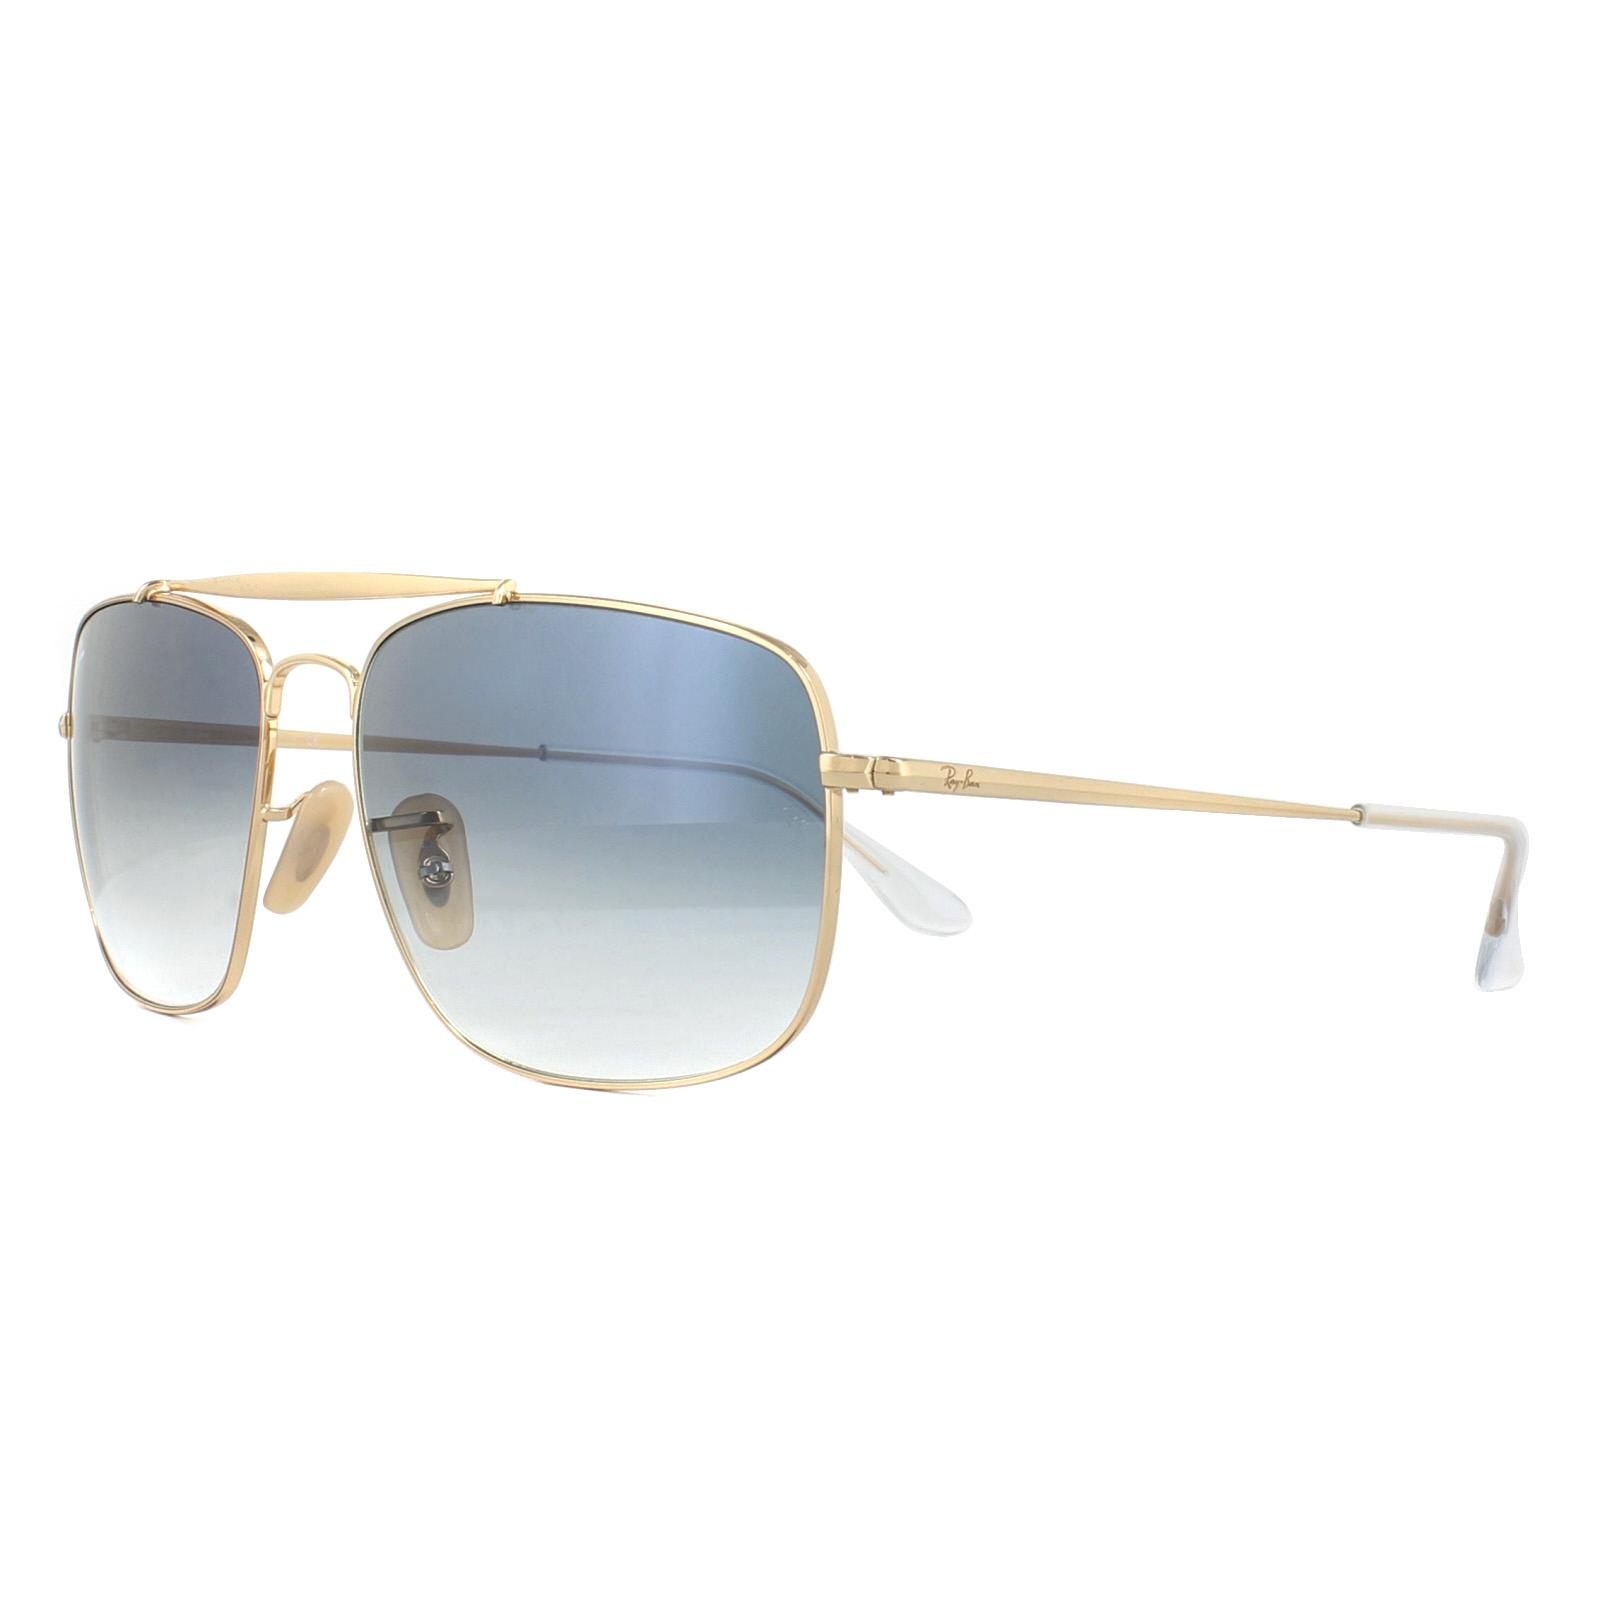 Sentinel Ray-Ban Sunglasses The Colonel RB3560 001 3F Gold Blue Gradient 983ddb8e03